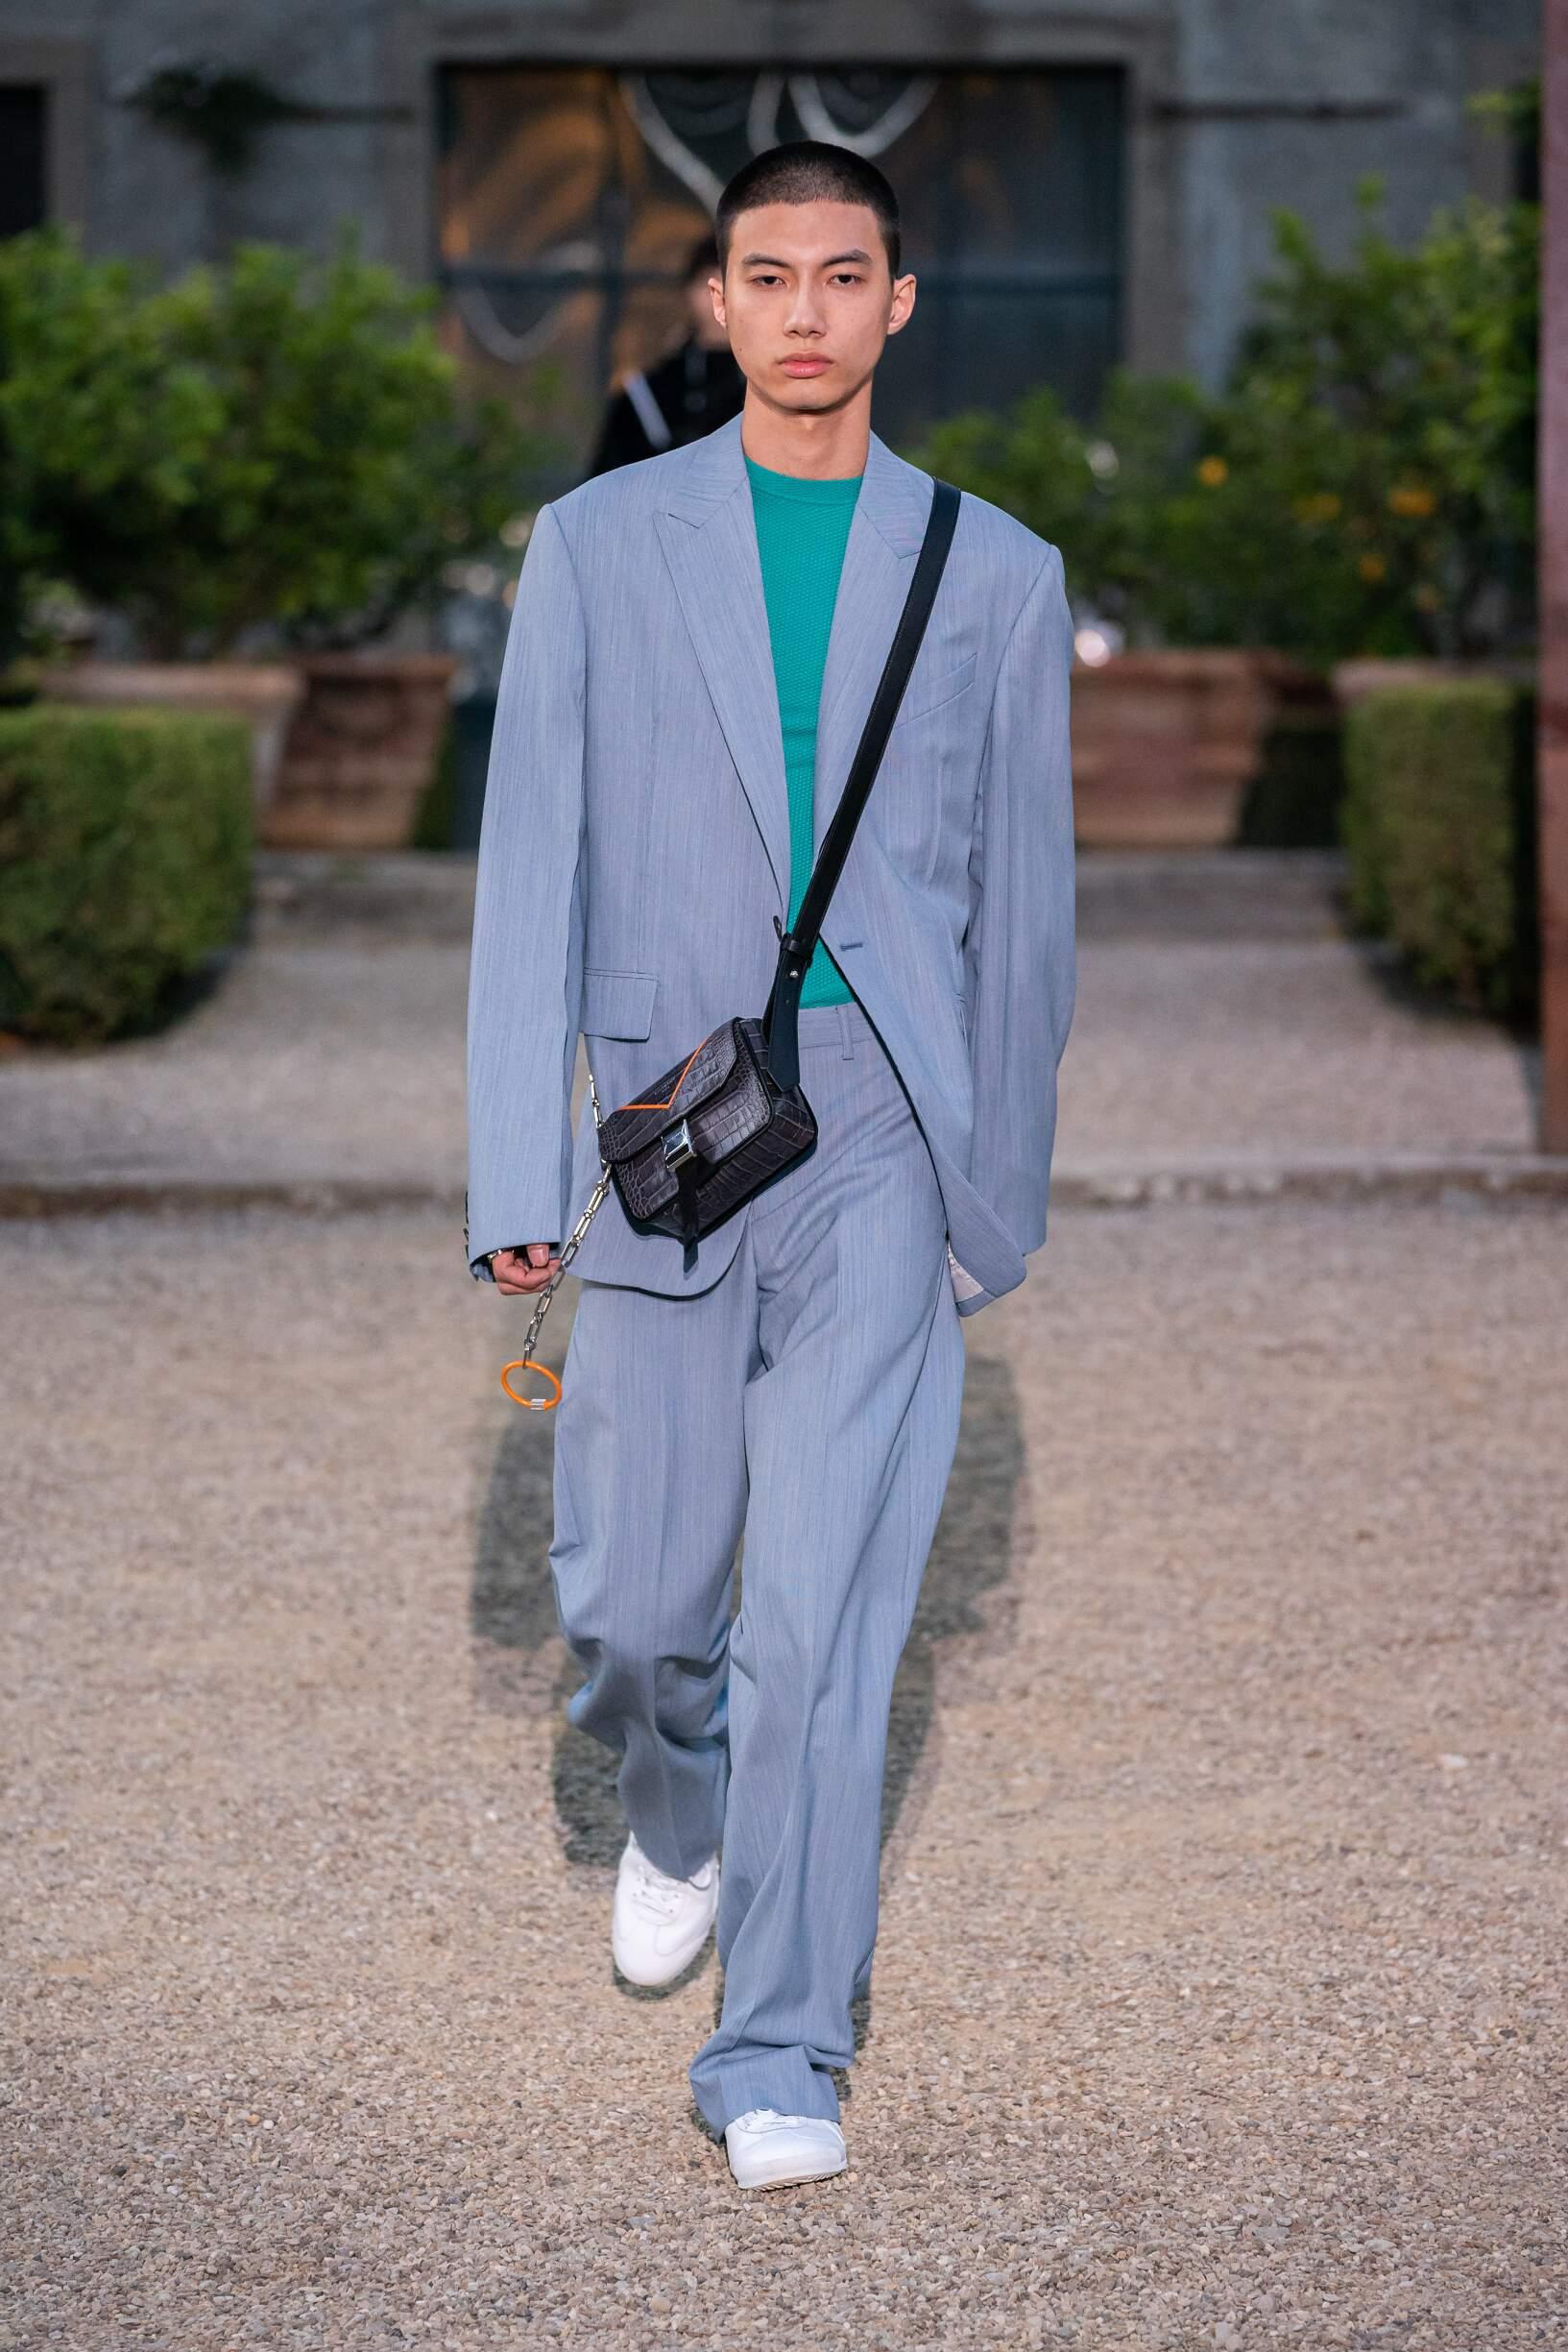 Givenchy Spring 2020 Catwalk